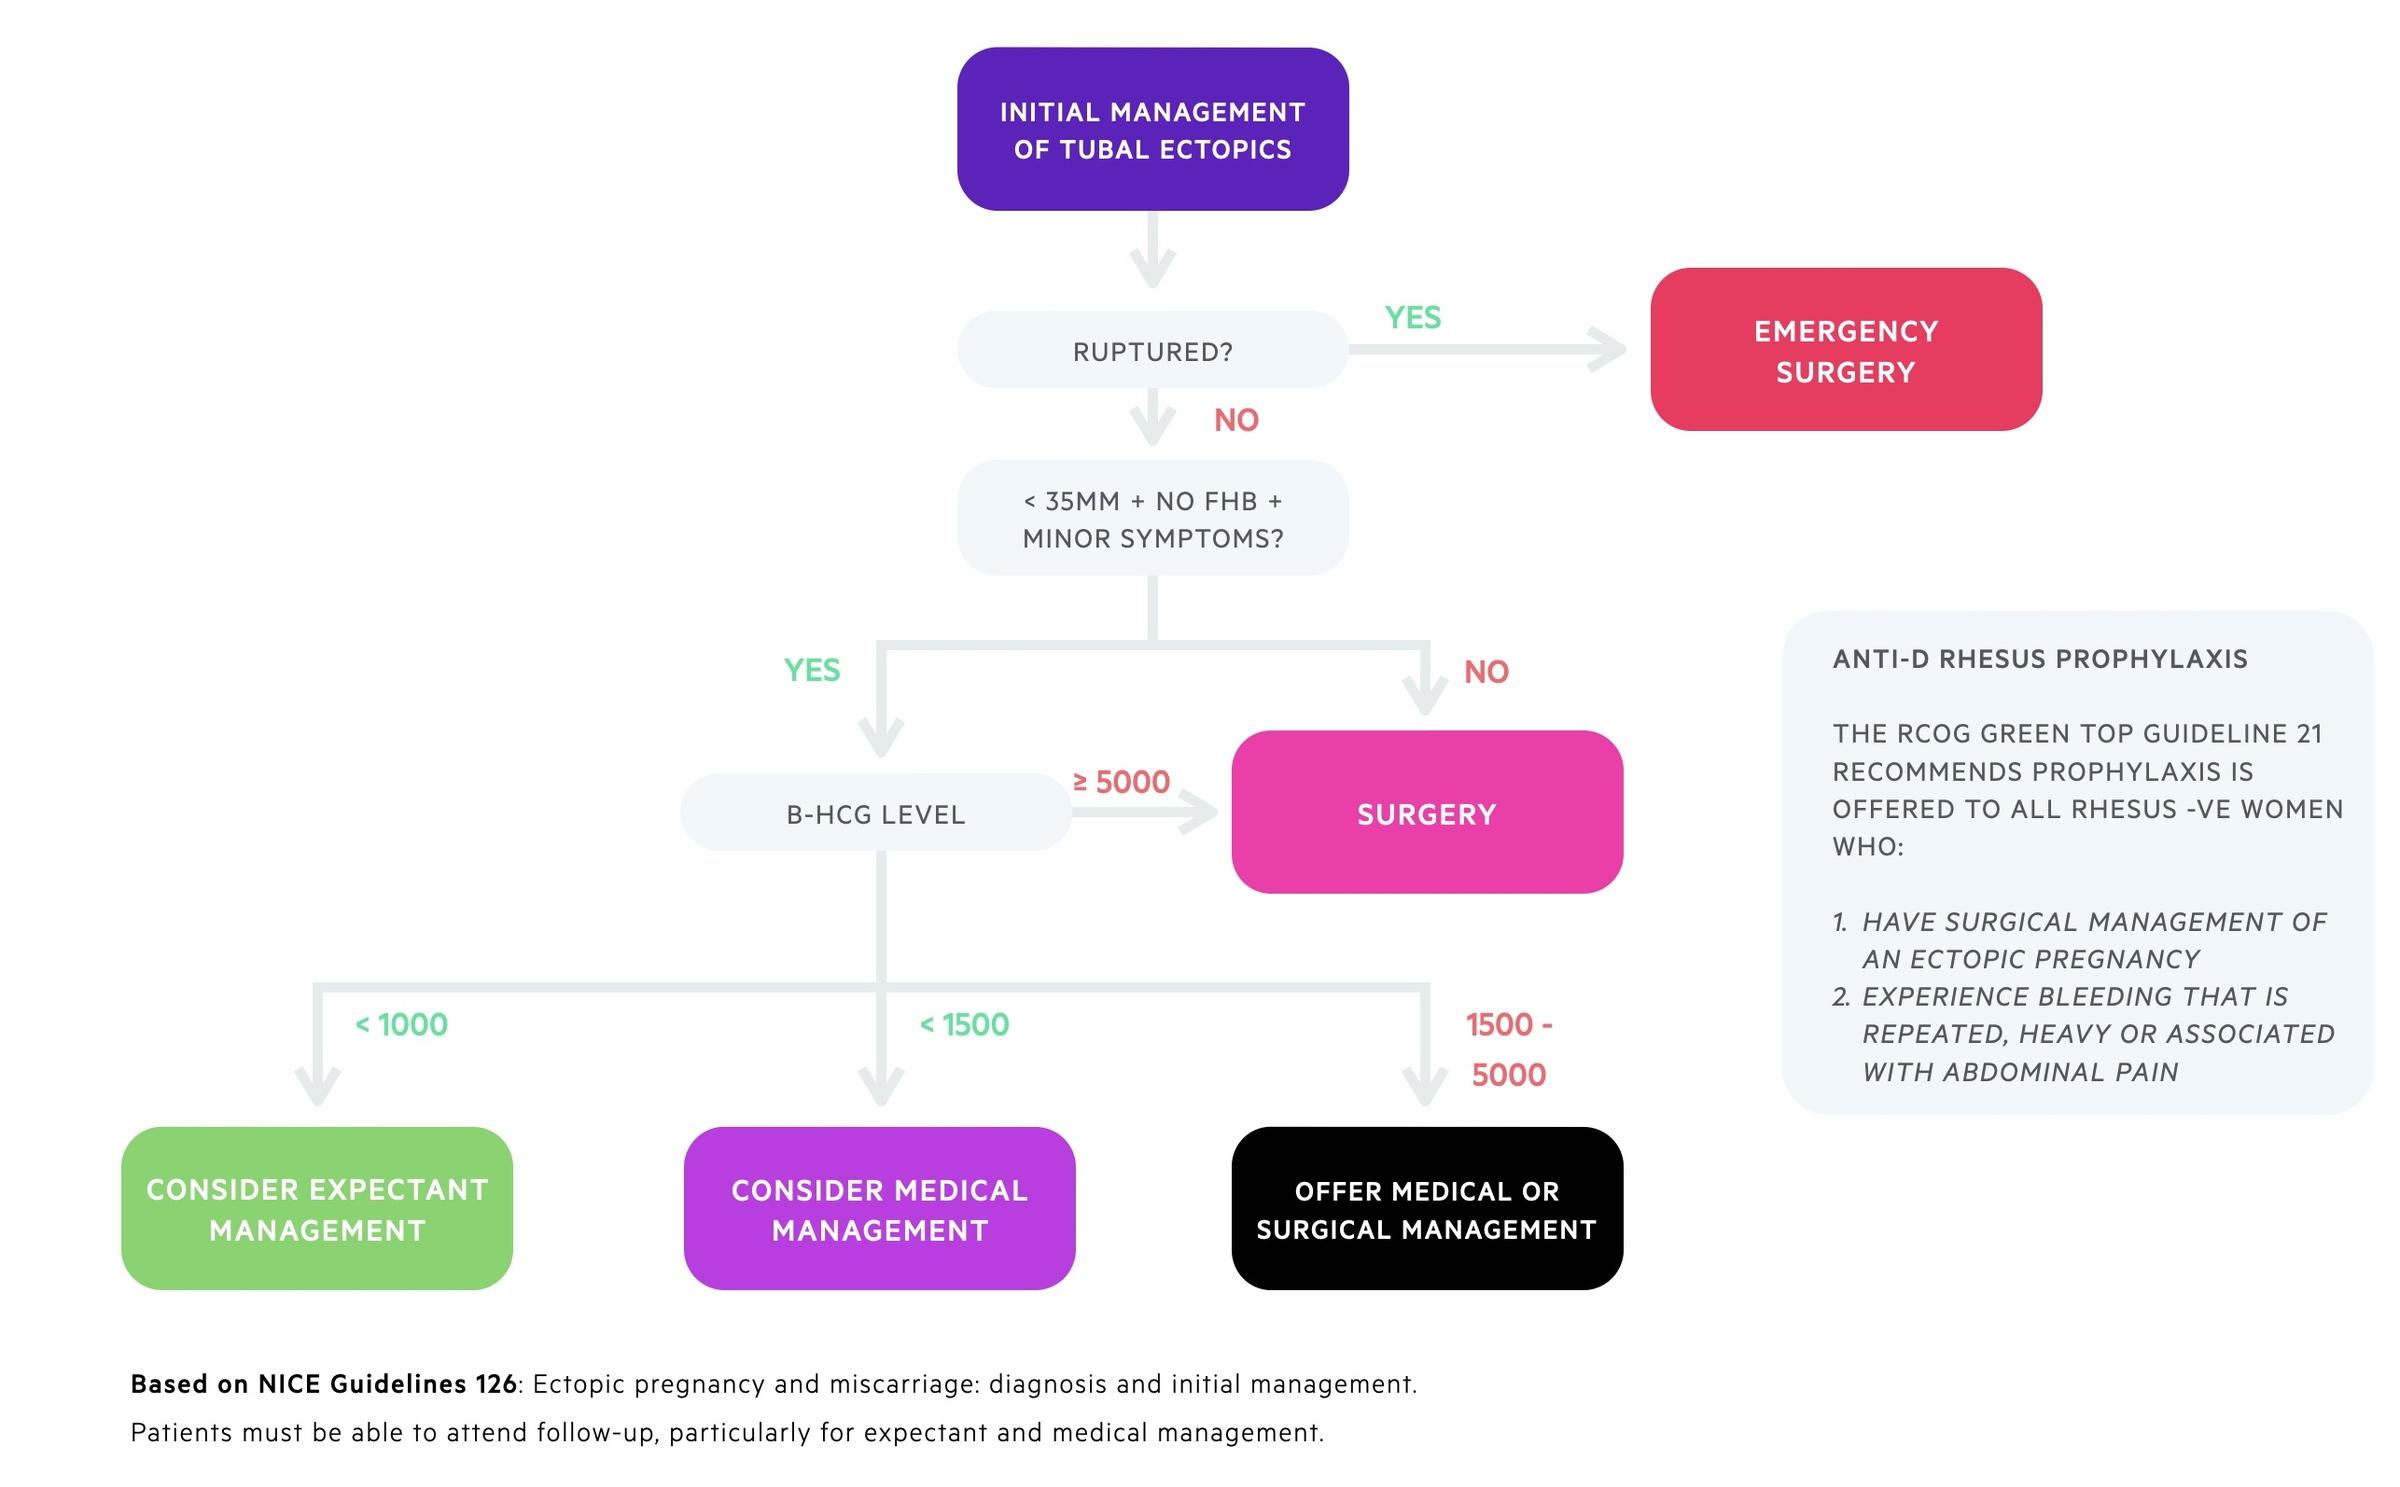 Management of tubal ectopics